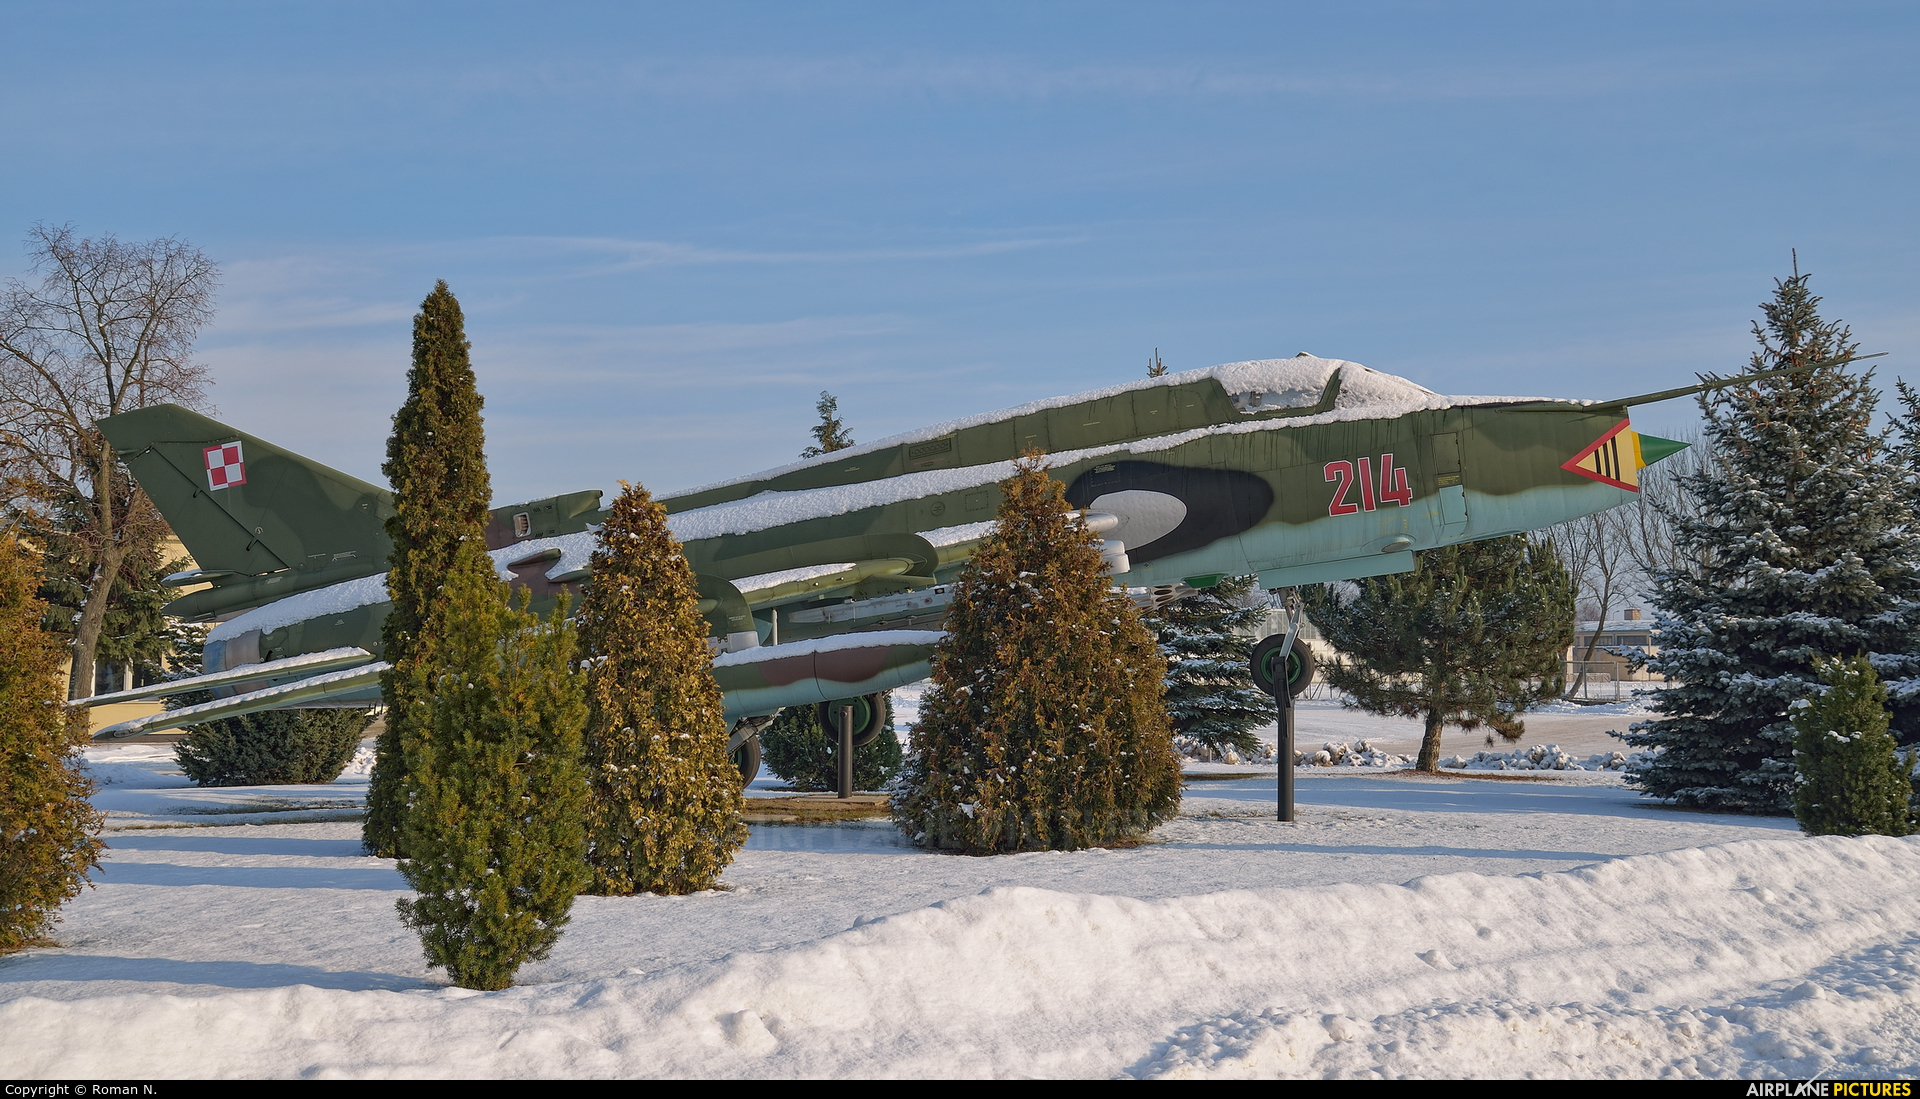 Poland - Air Force 3214 aircraft at Bydgoszcz - Szwederowo